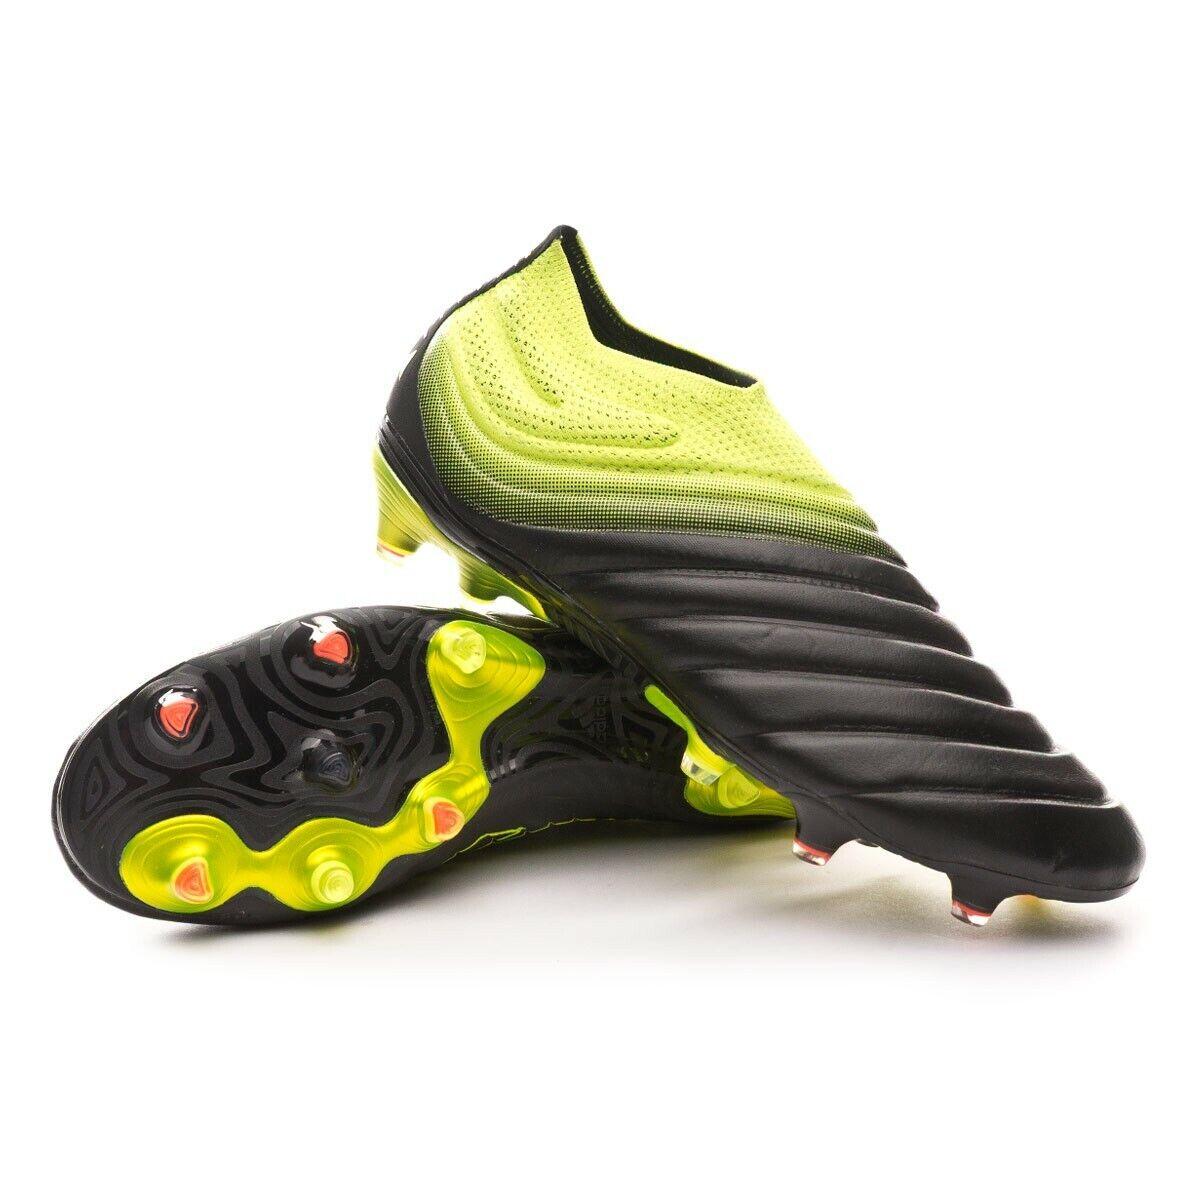 Adidas Copa 19+ Fg Football Crampons schwarz Fluo US 8.5 UK 8